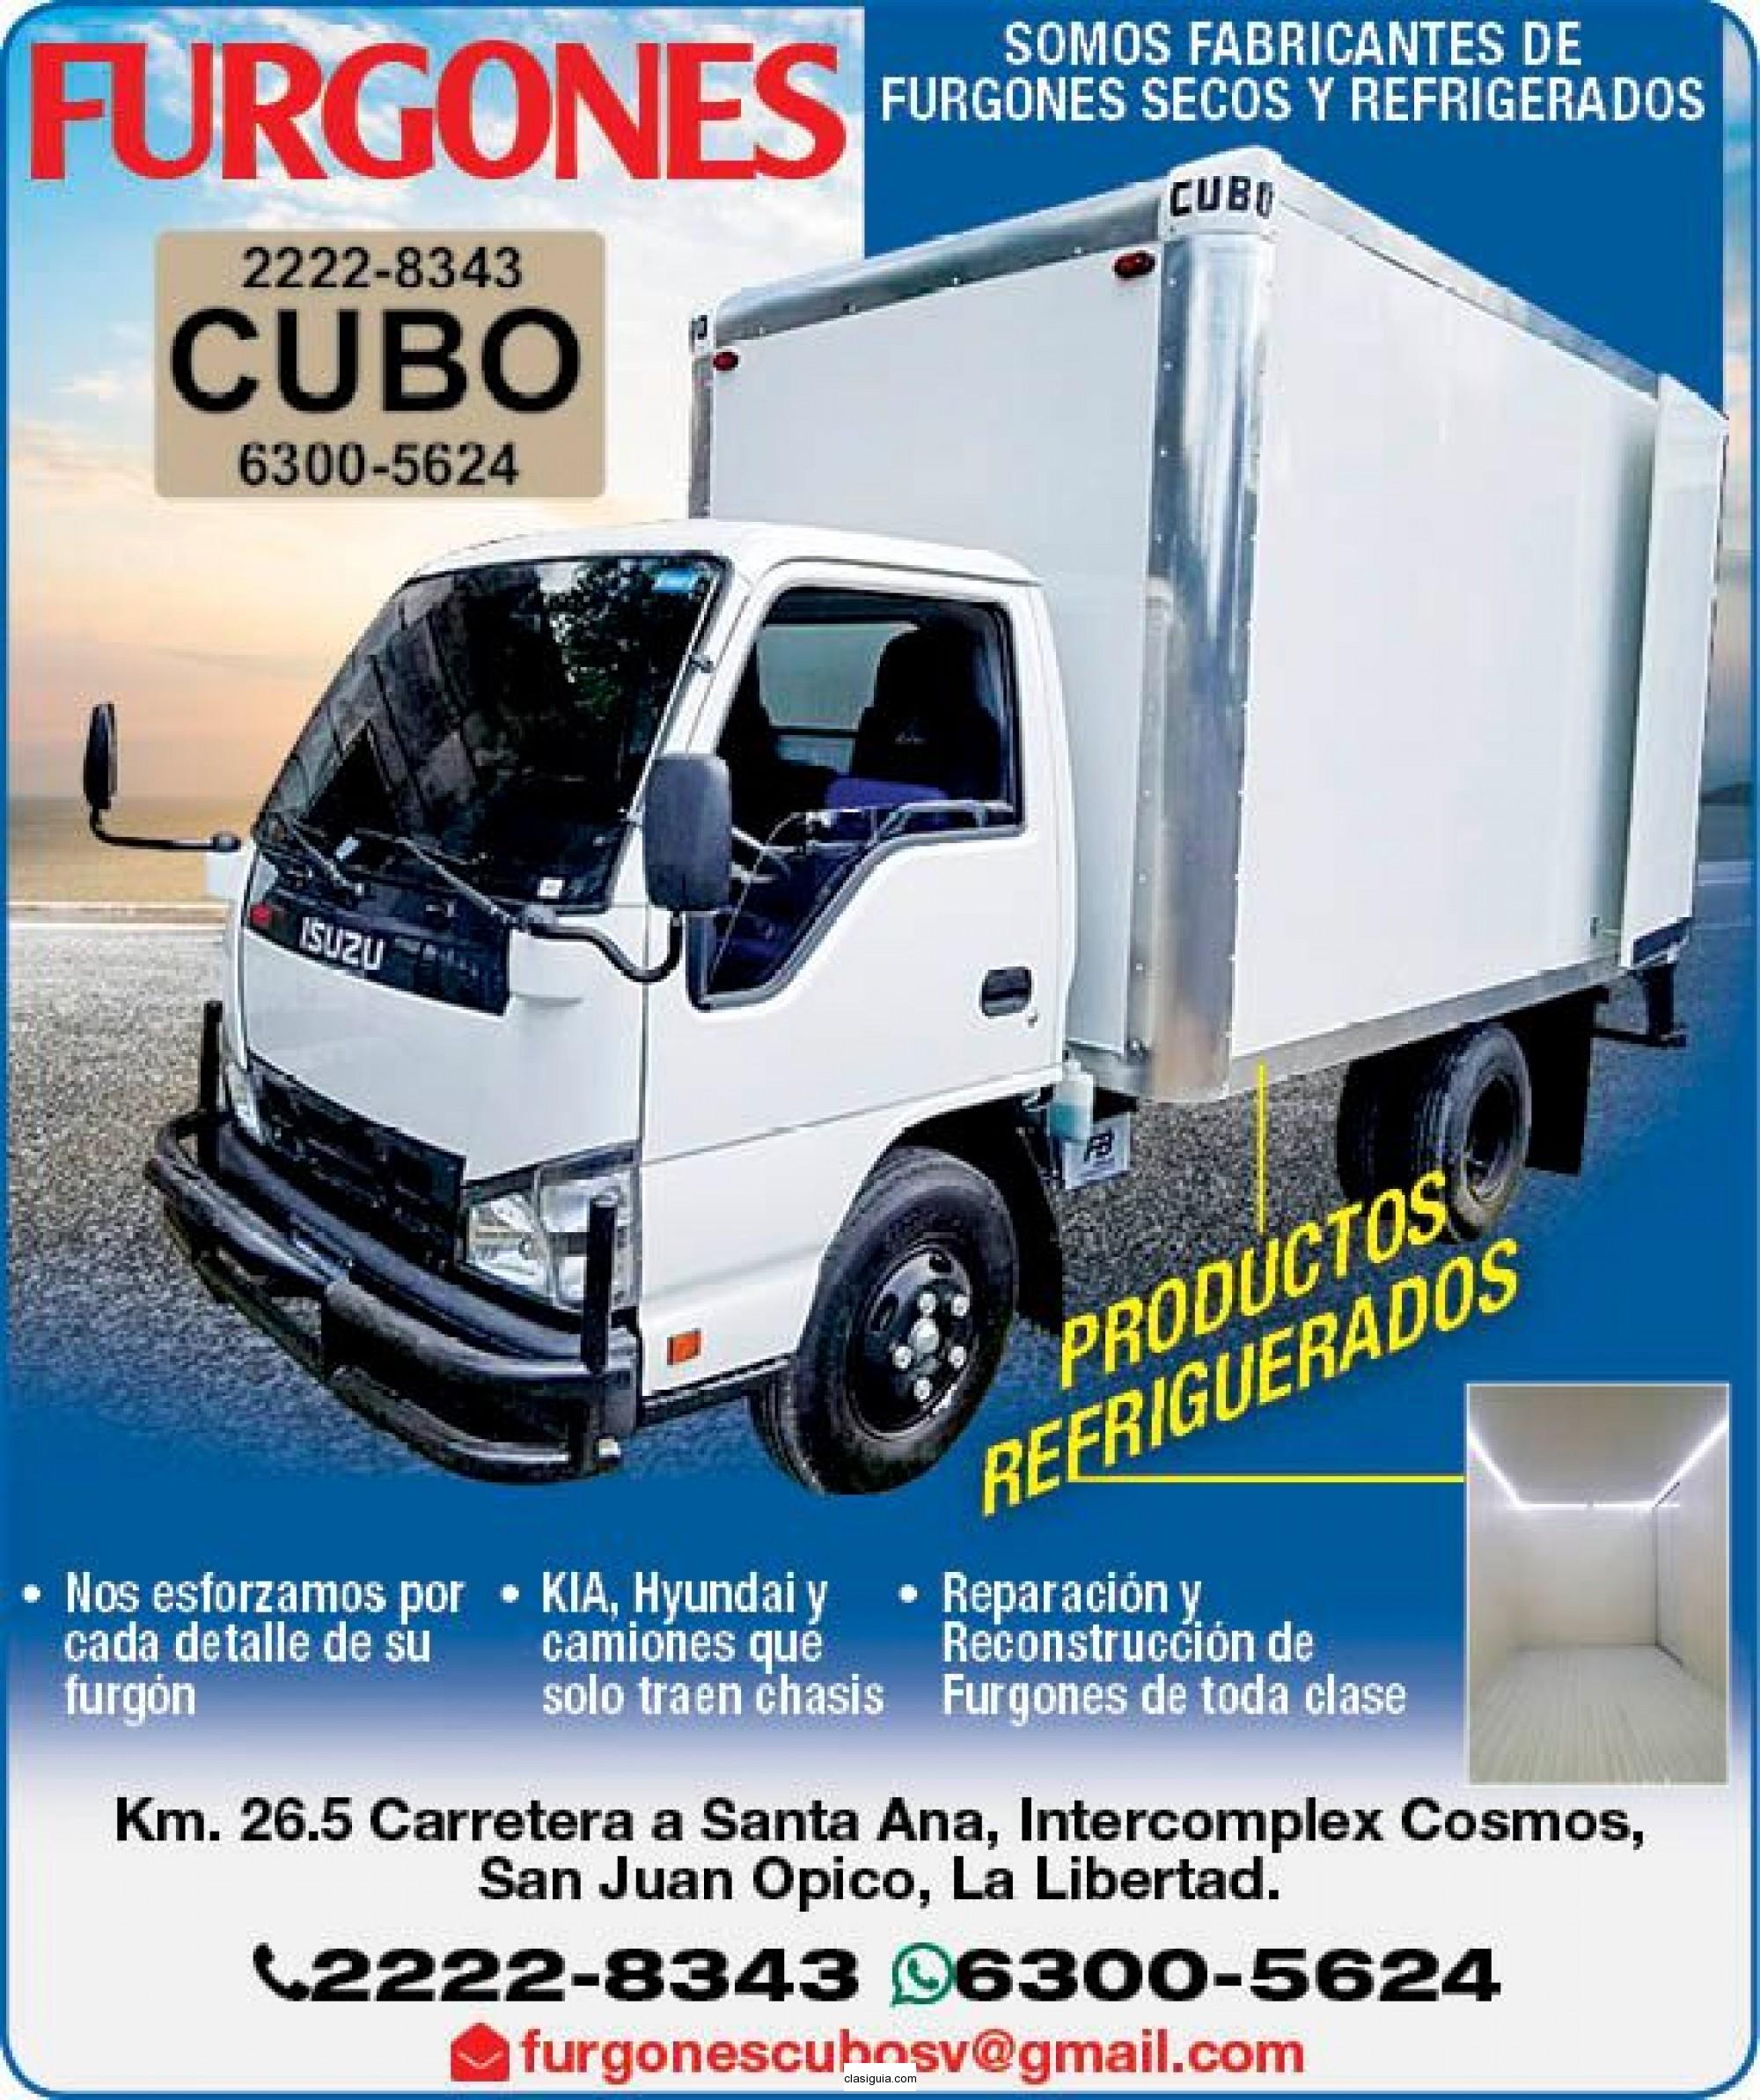 FURGONES CUBO